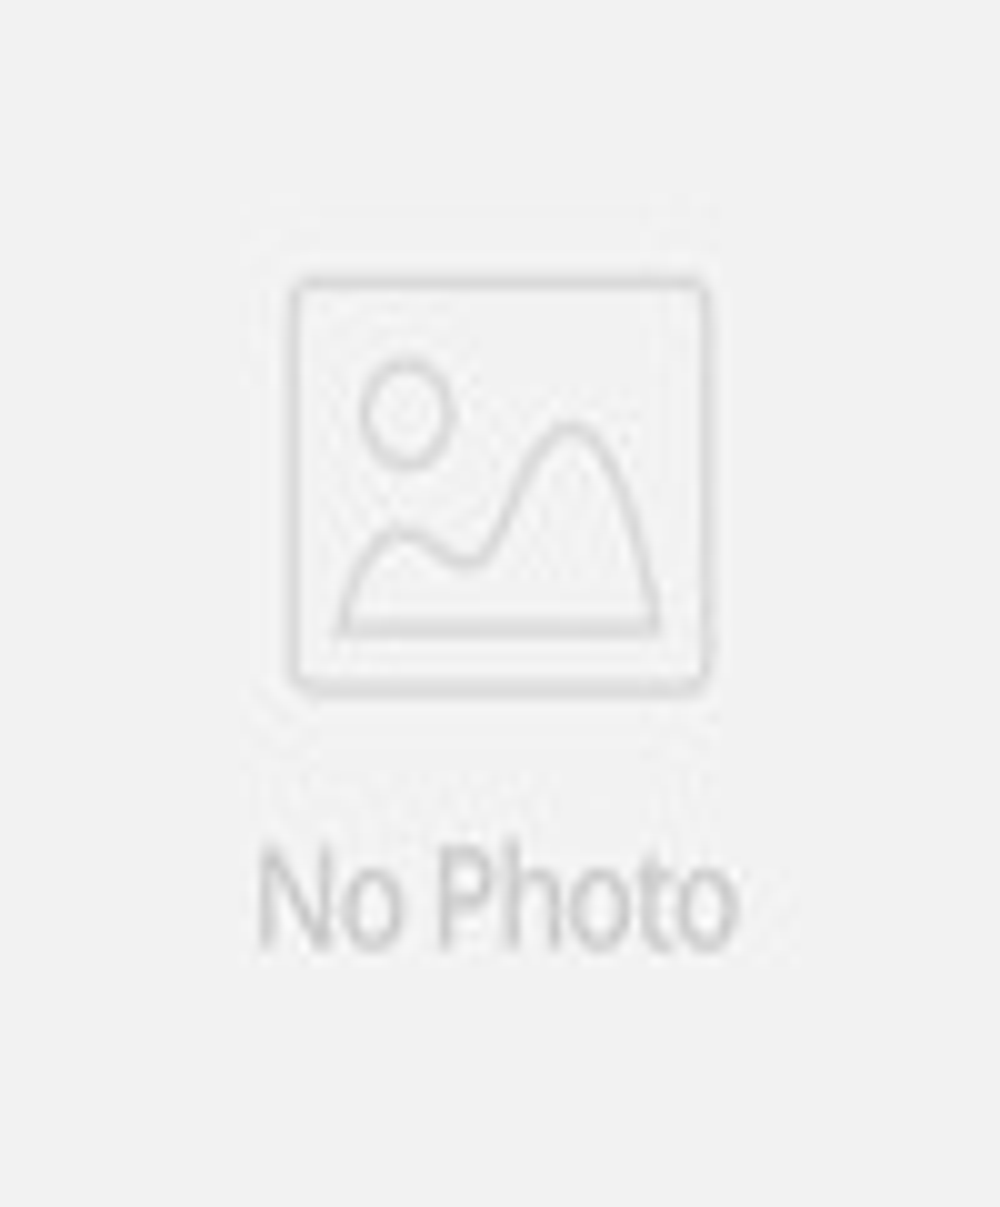 Designer chaise d 39 oeufs magasin darticles promotionnels 0 sur aliexpres - Meuble philippe starck ...